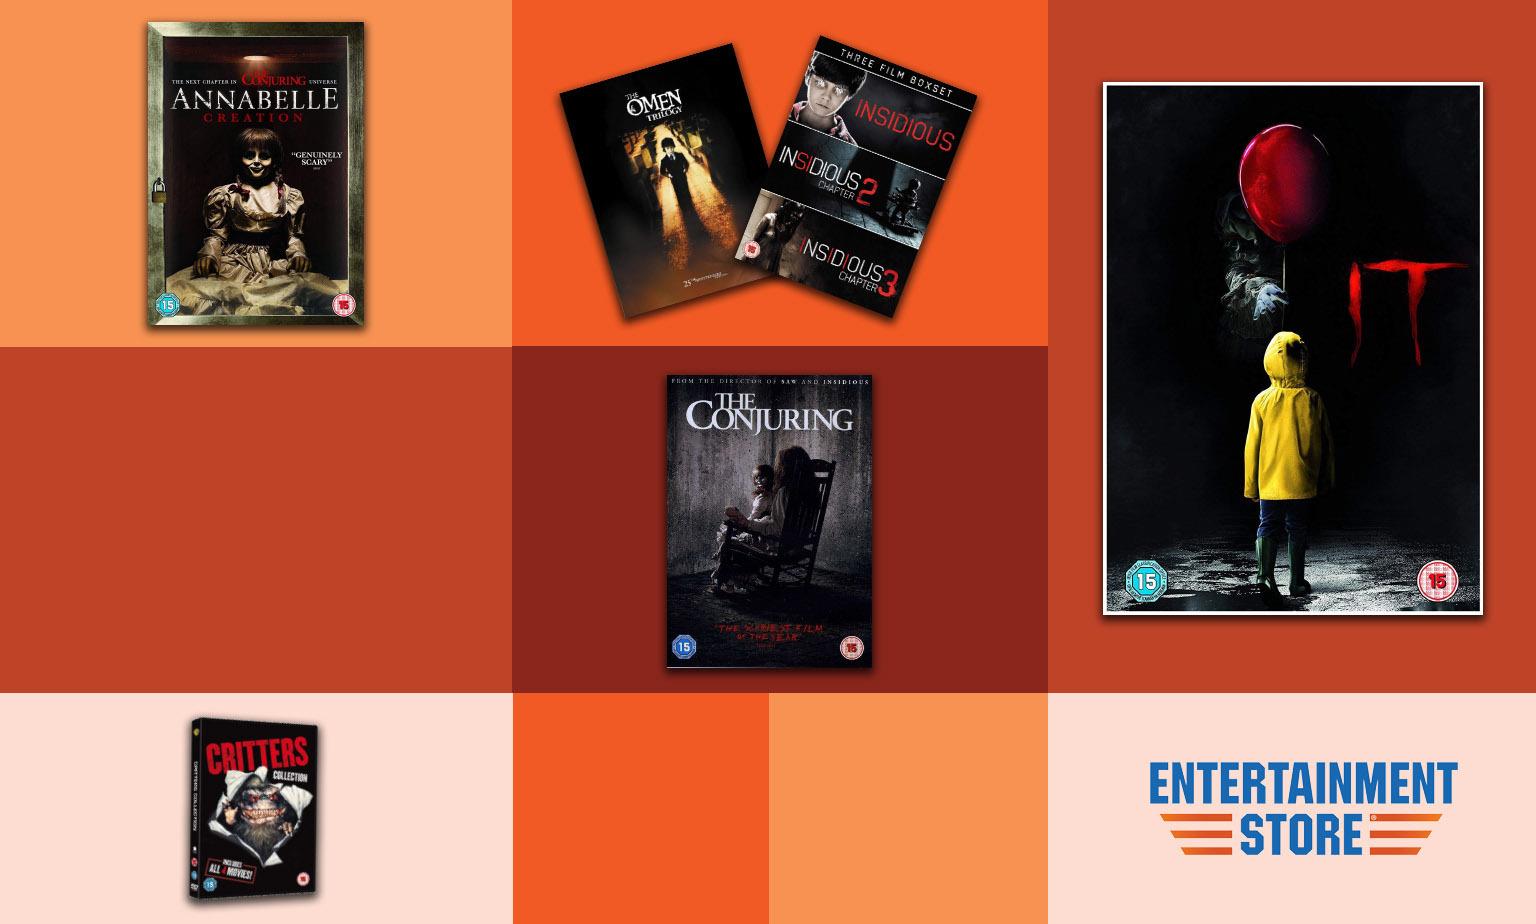 entertainment shop | ebay books, dvd & blu-ray, cd & vinyl and video